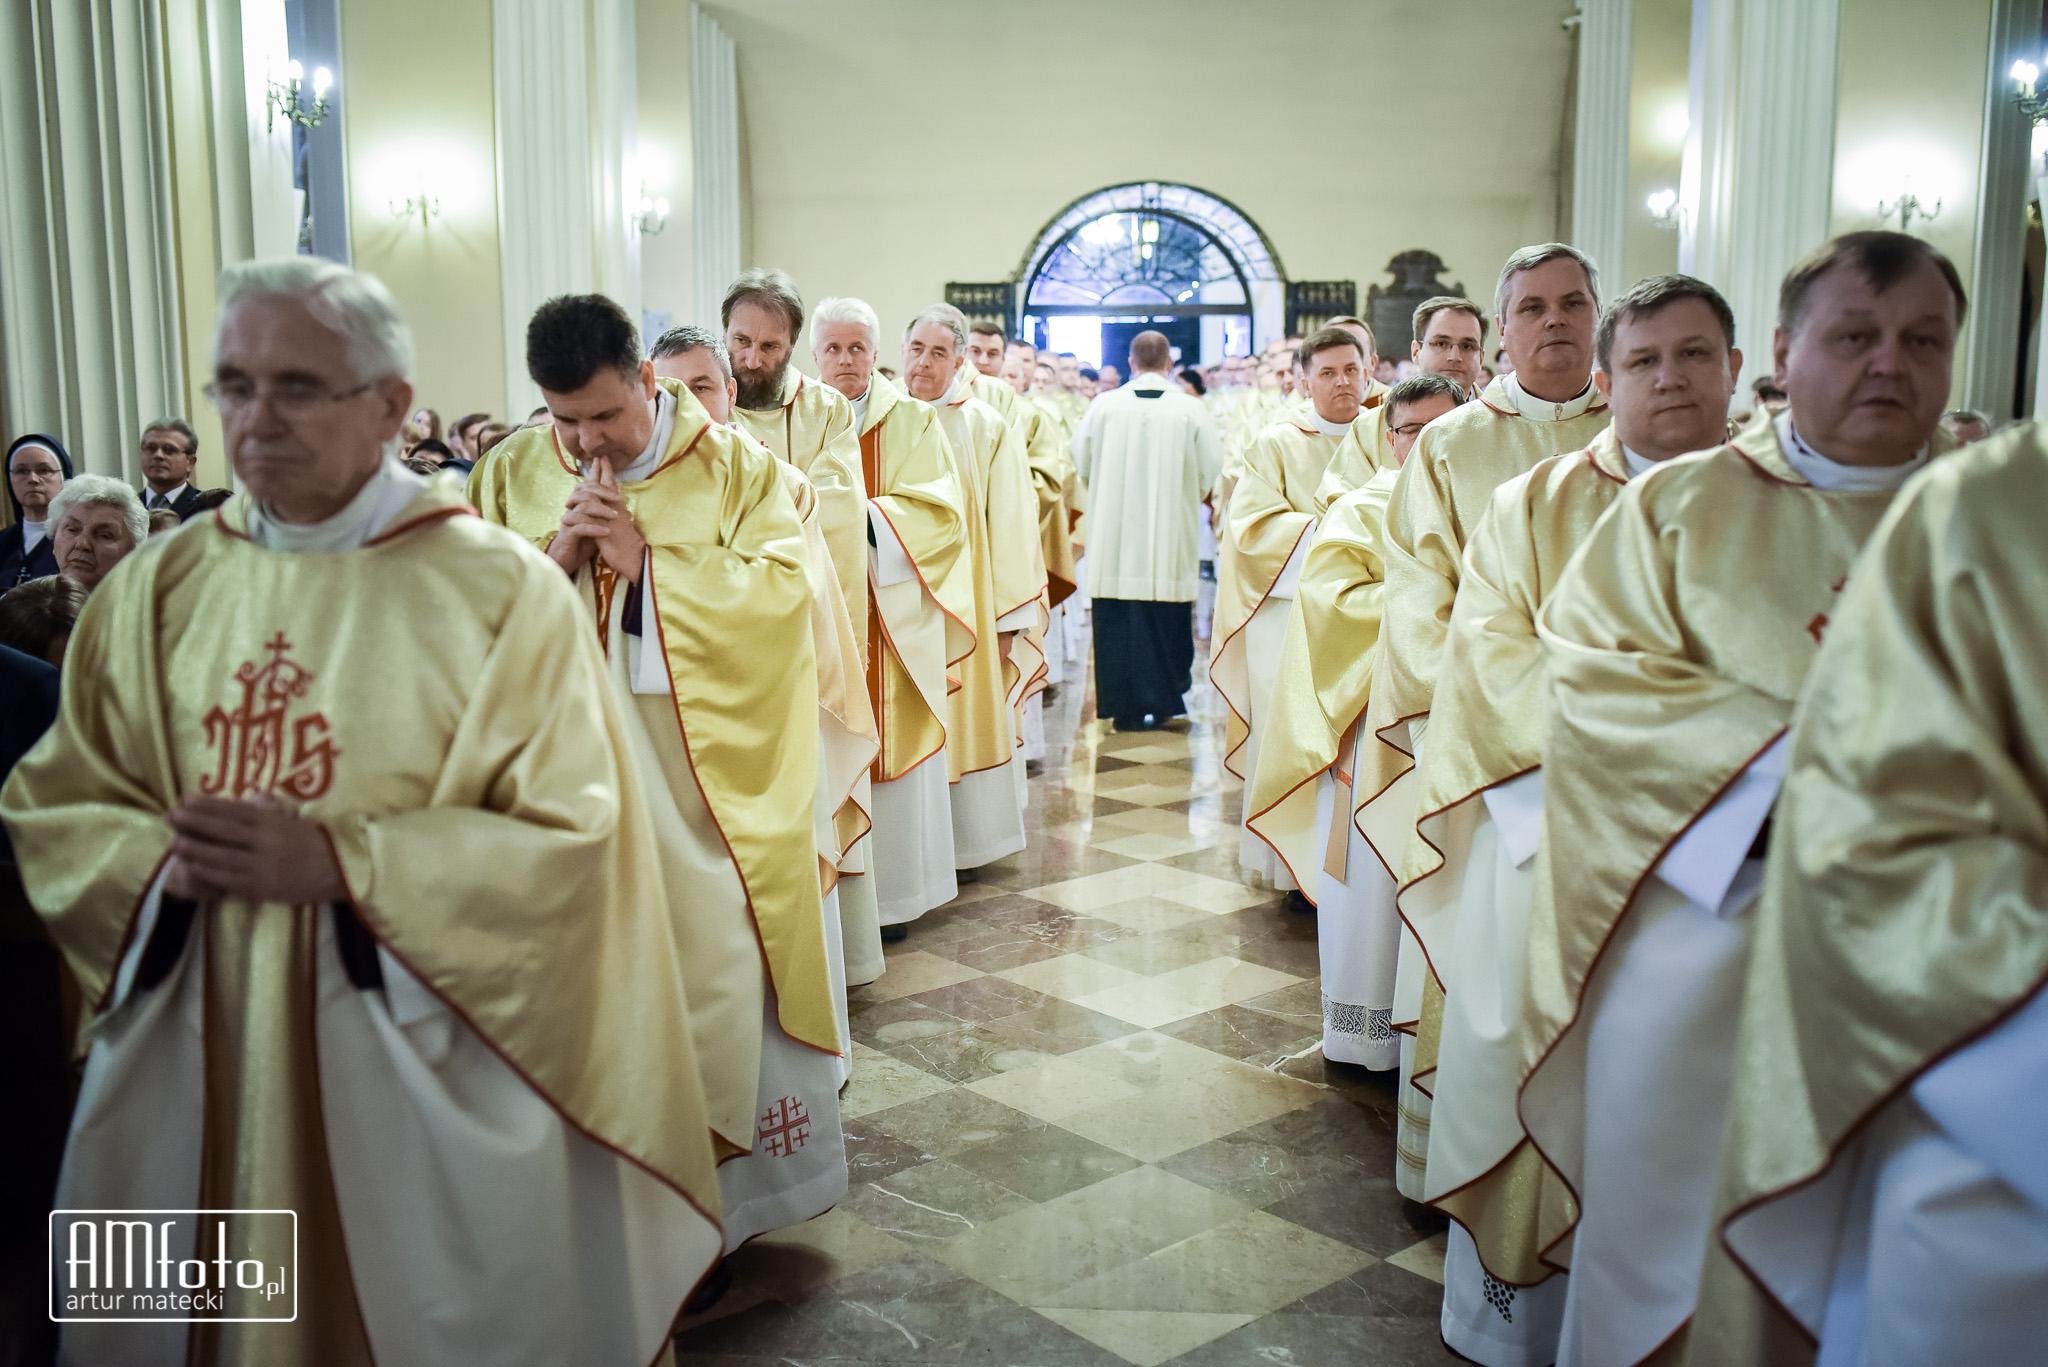 Swiecenia_Prezbiteratu_27-05-2017__Kalisz____www_amfoto_pl___0351____AMF_5426.jpg